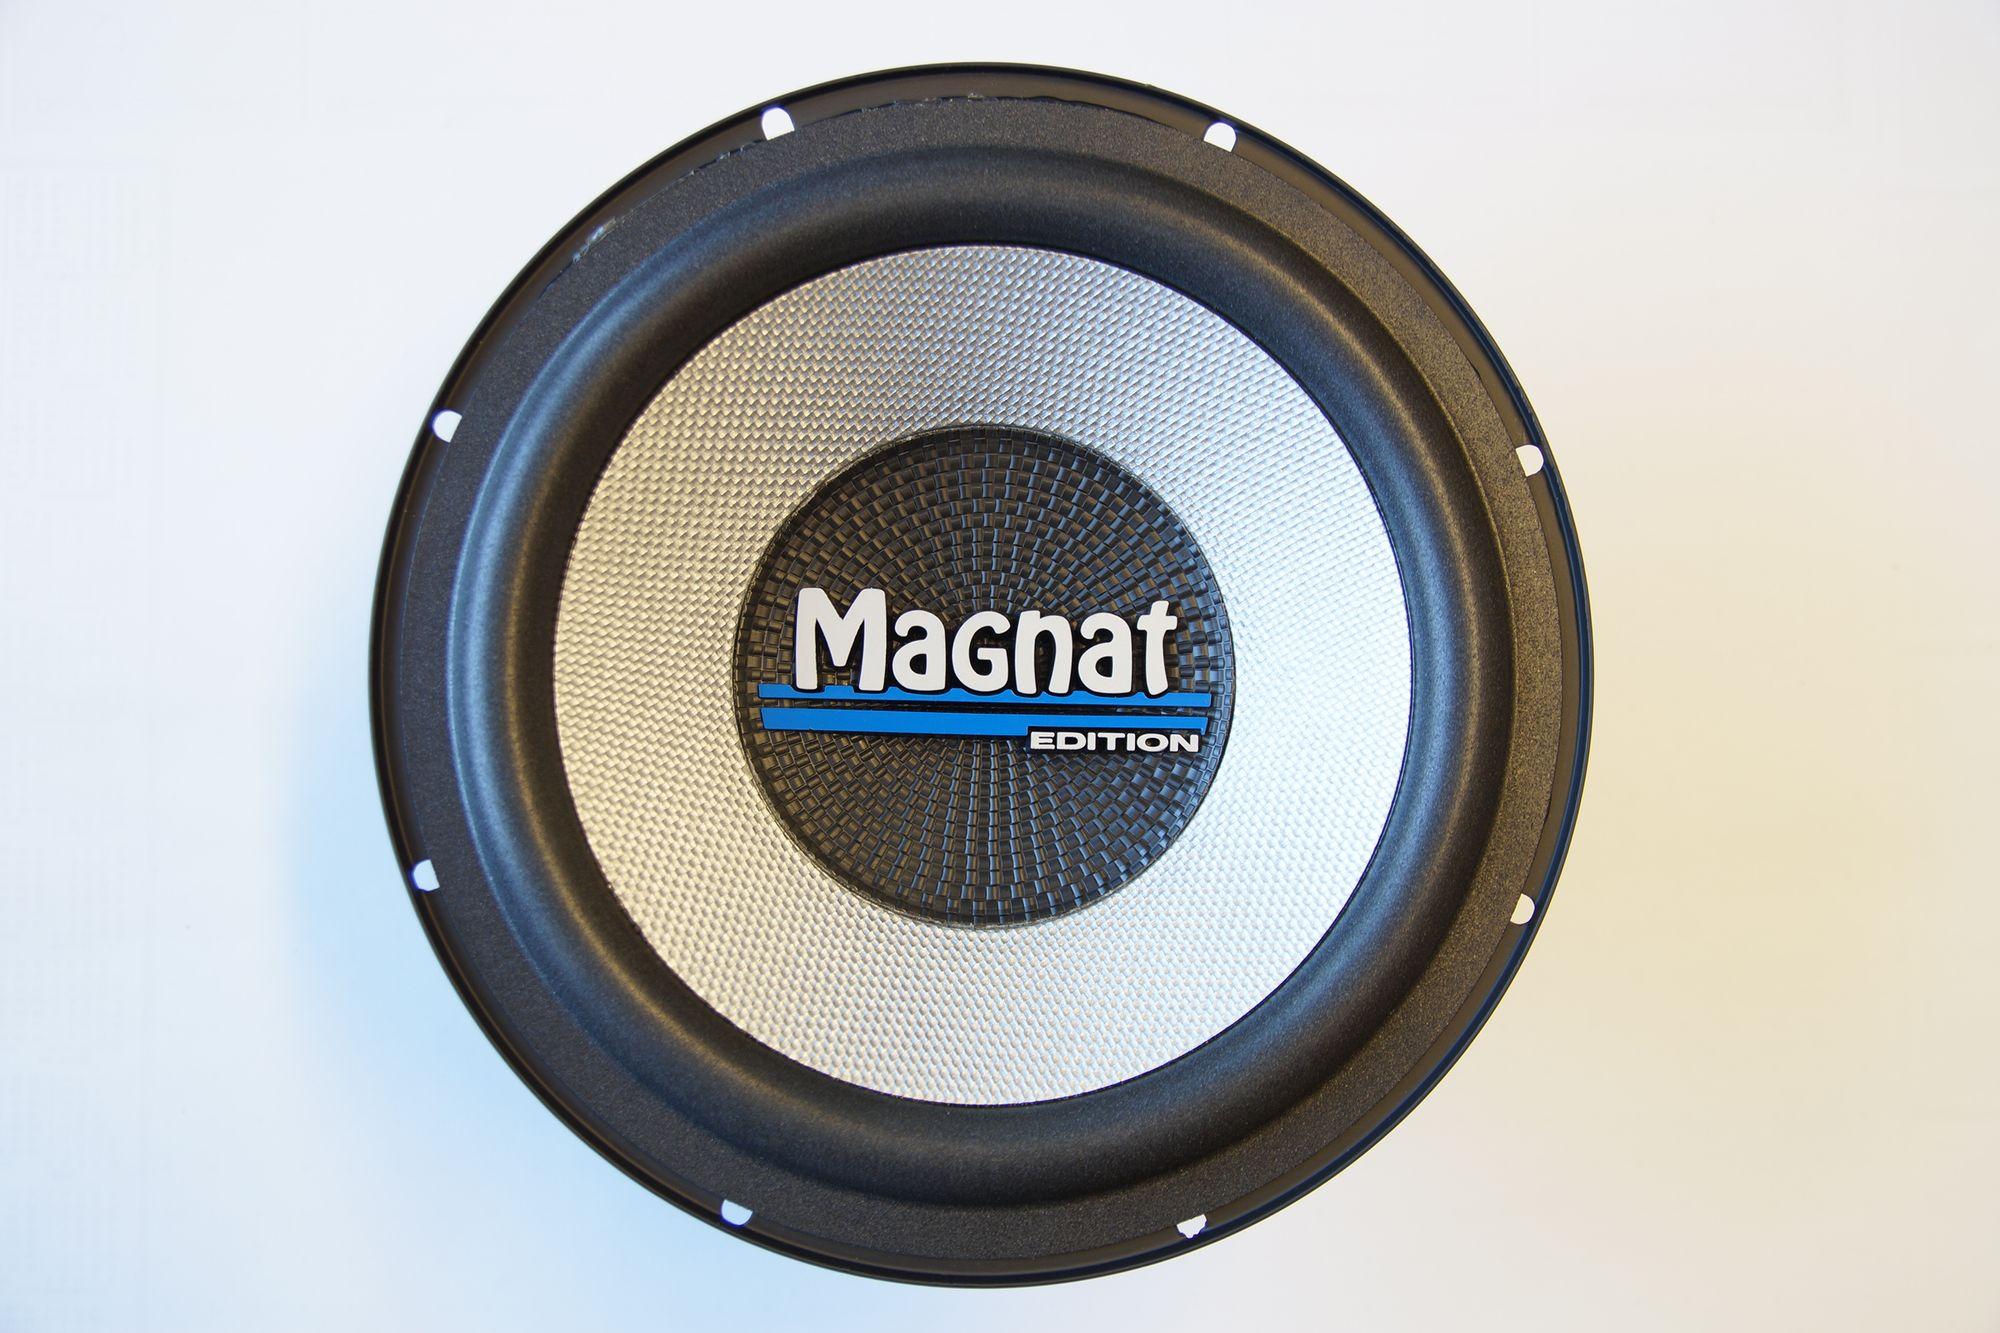 "8"" 20 cm Subwoofer Magnat Edition BP 20 Basslautsprecher/Tieftöner MWS 200 PP 4110 001"